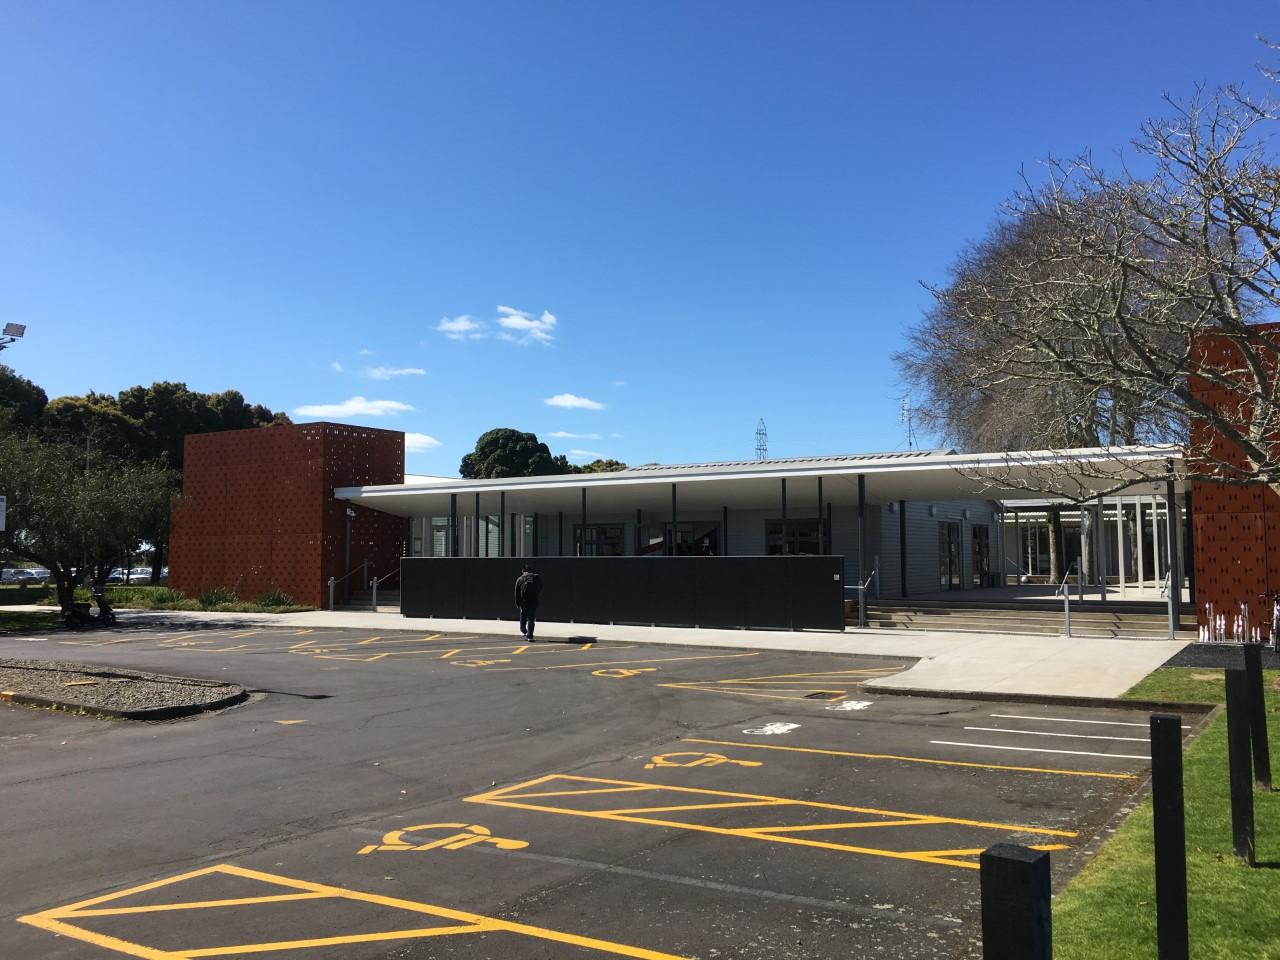 AUT, Manukau - Arrow International (NZ)